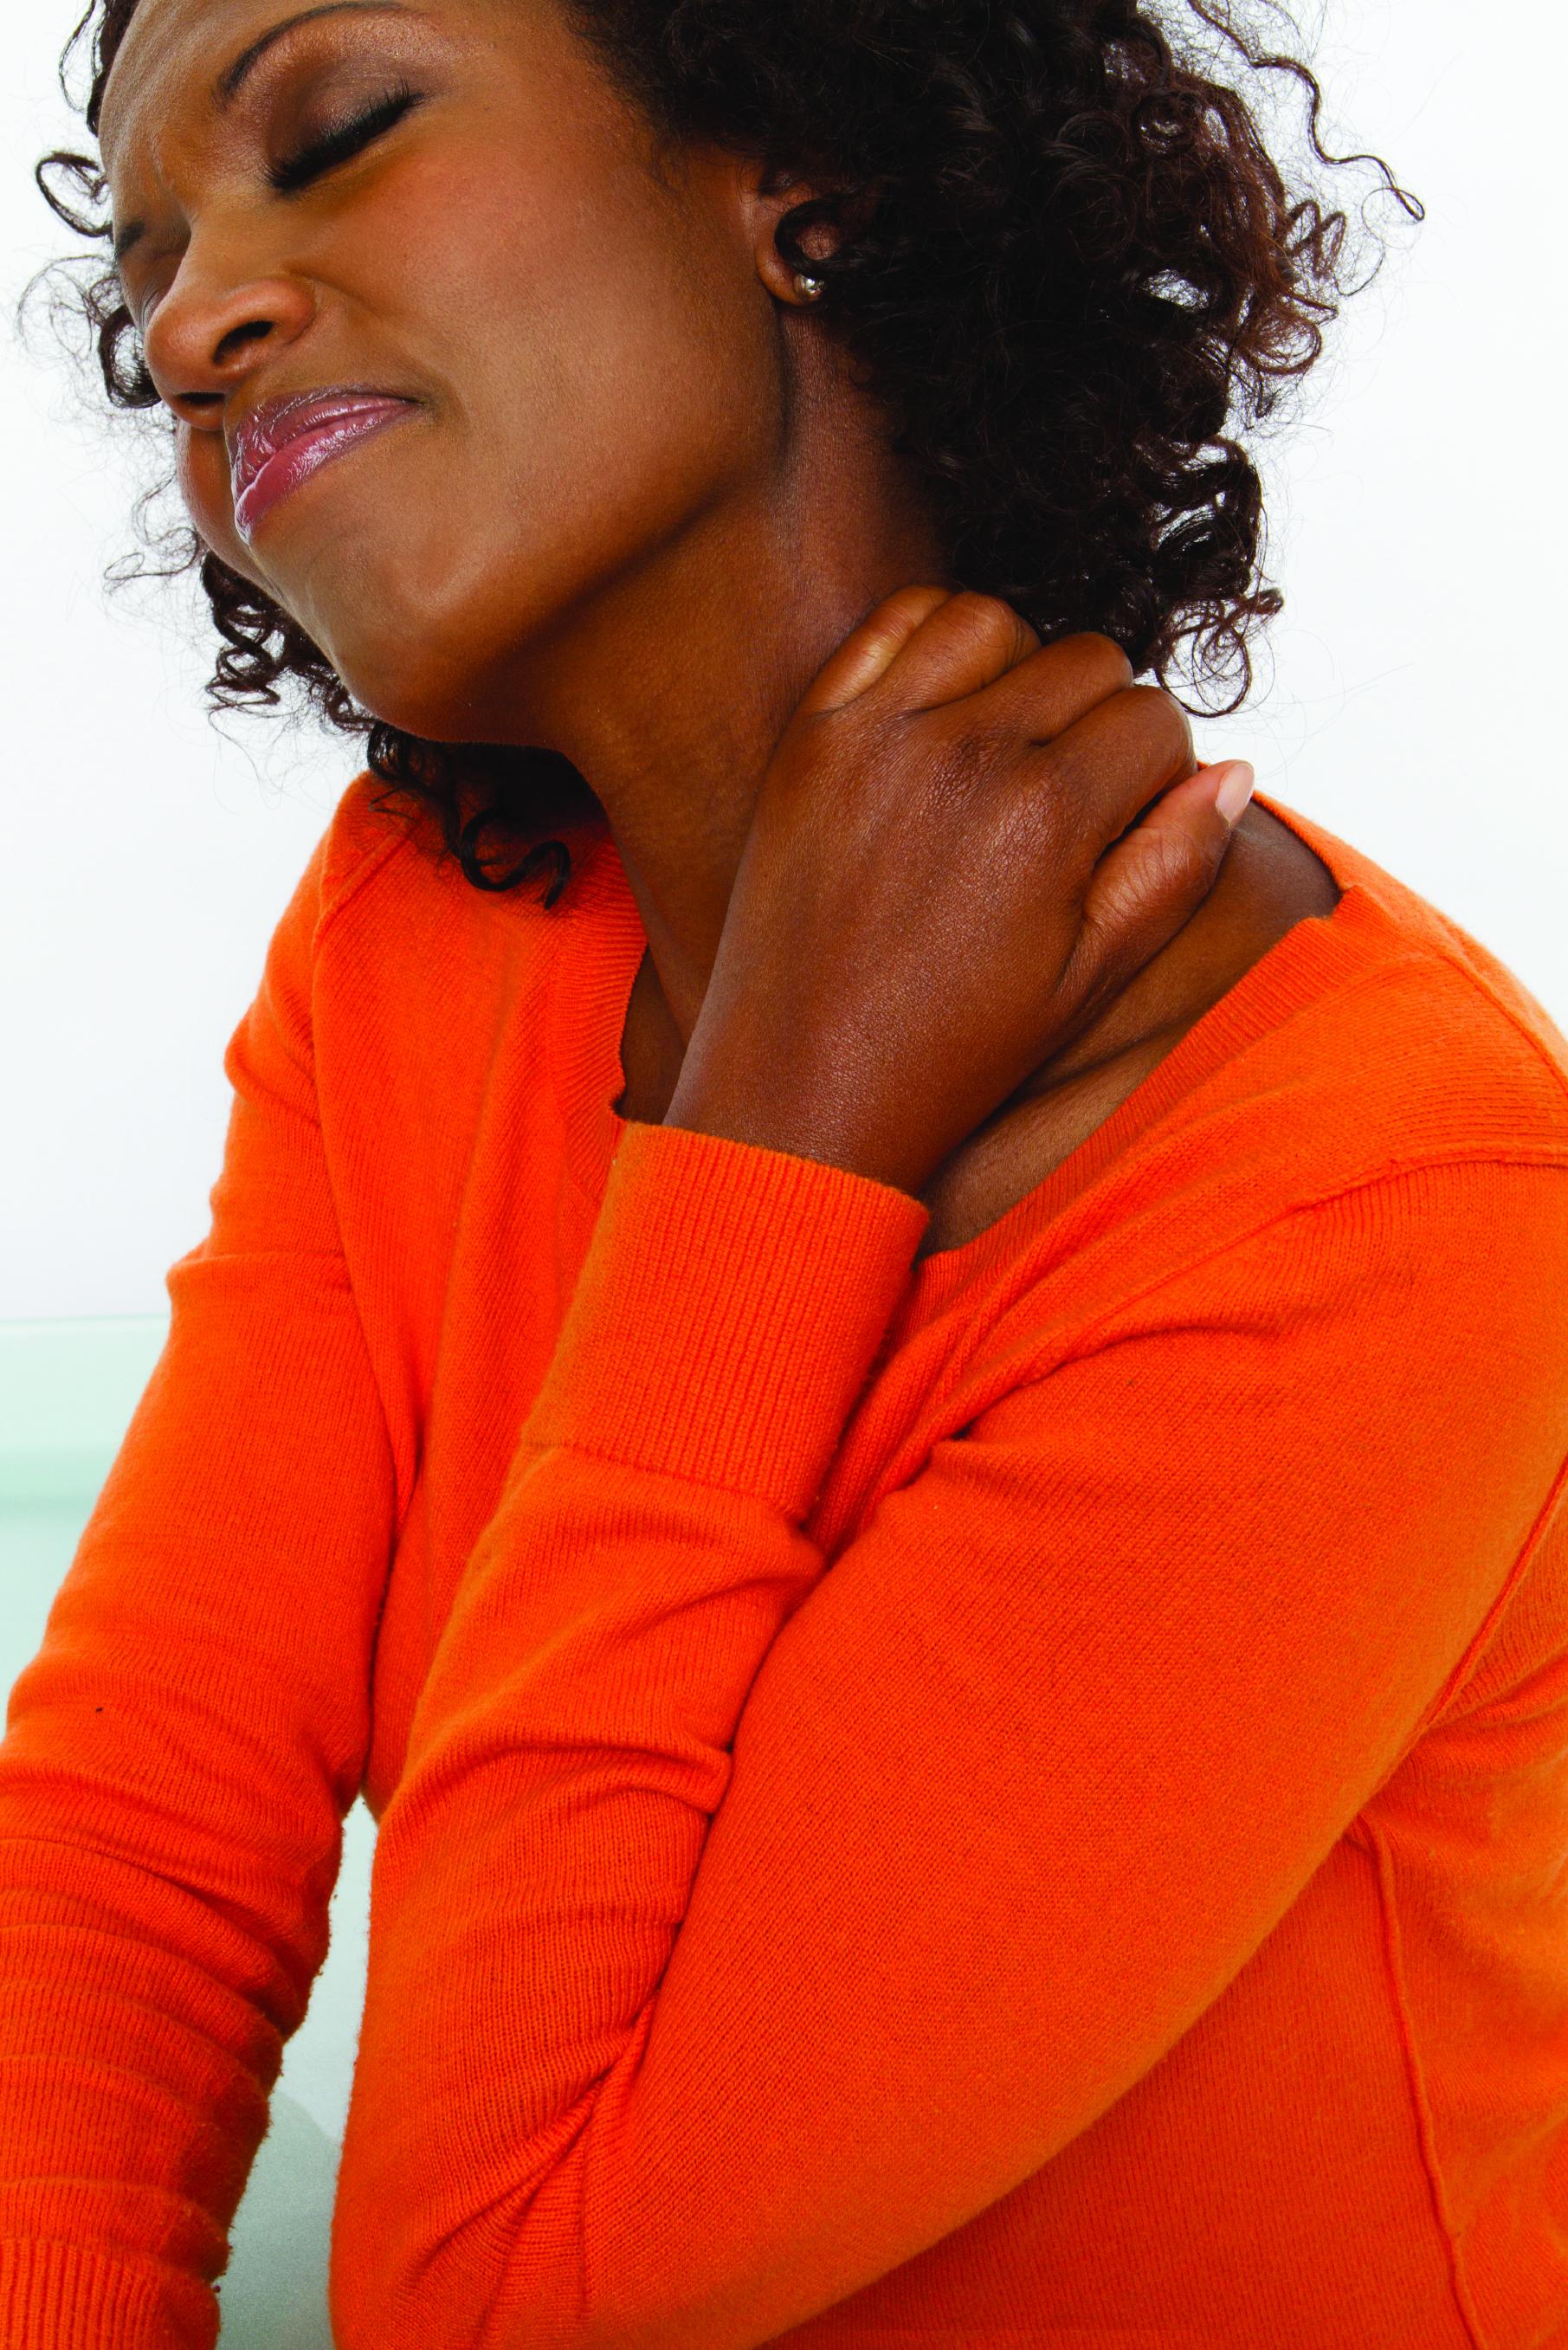 Marathons And Temporary Cardiac Tissue Damage: How To ...